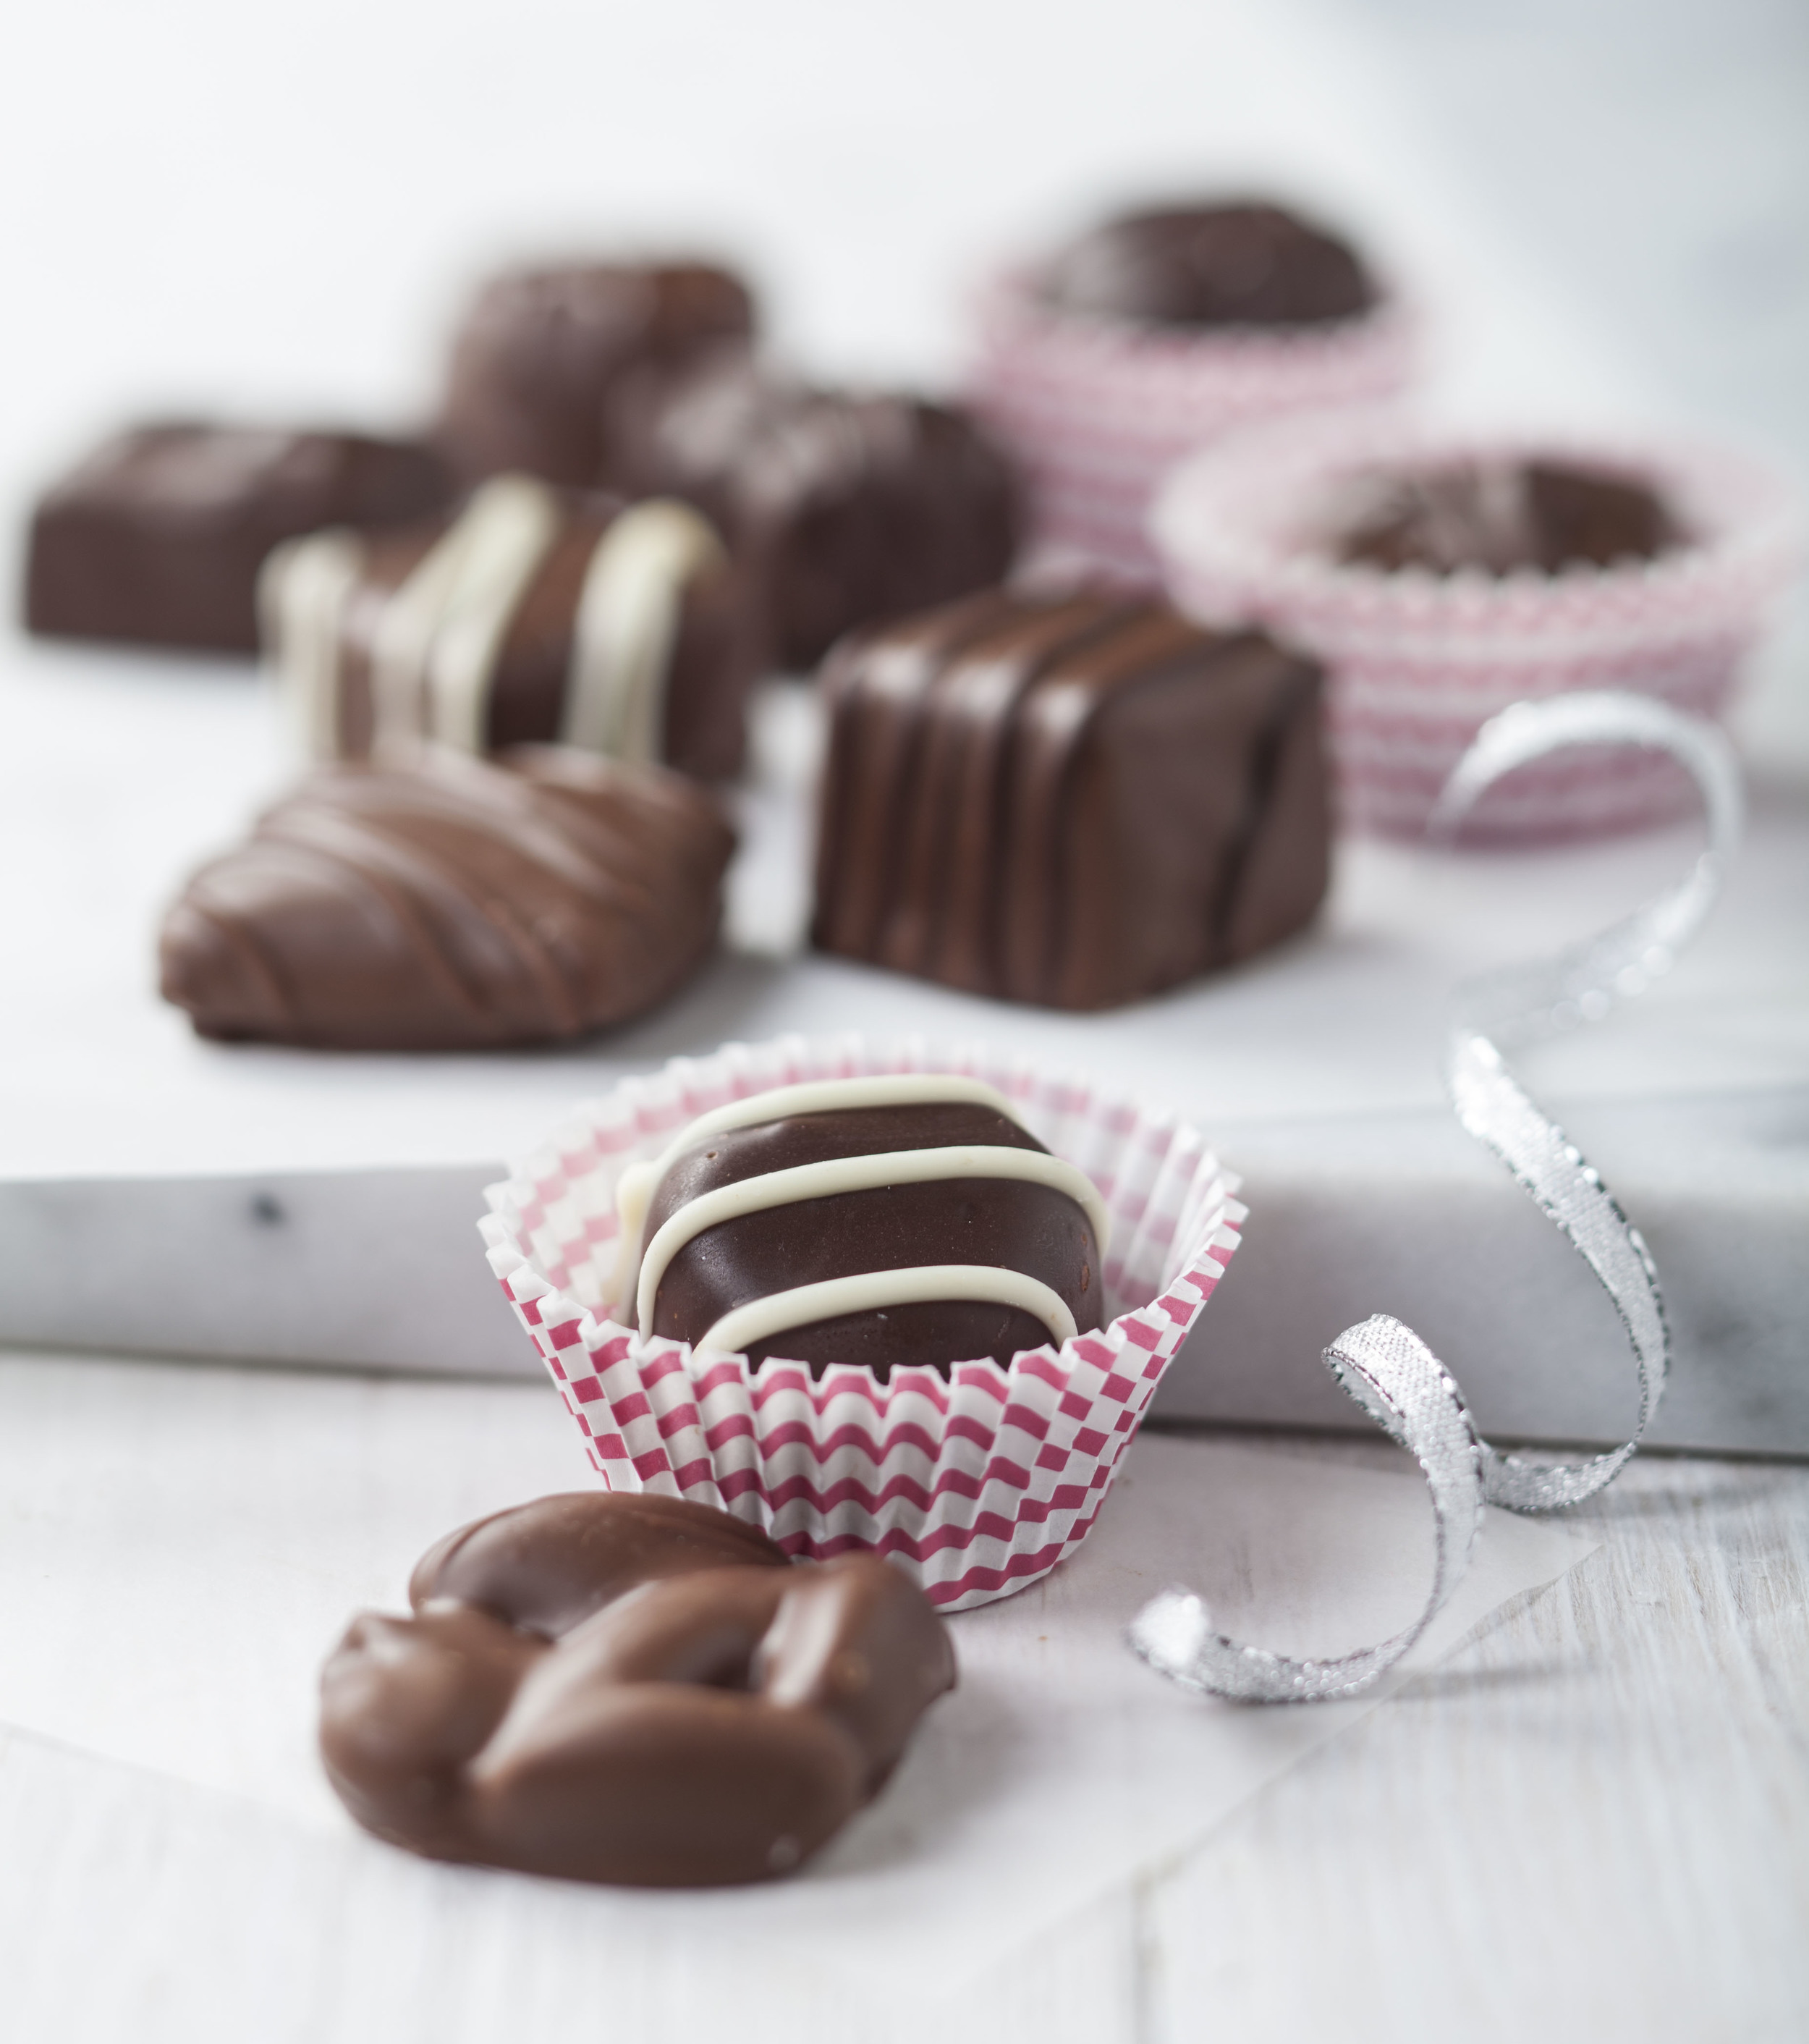 Chocolates and tin_381 copy.JPG